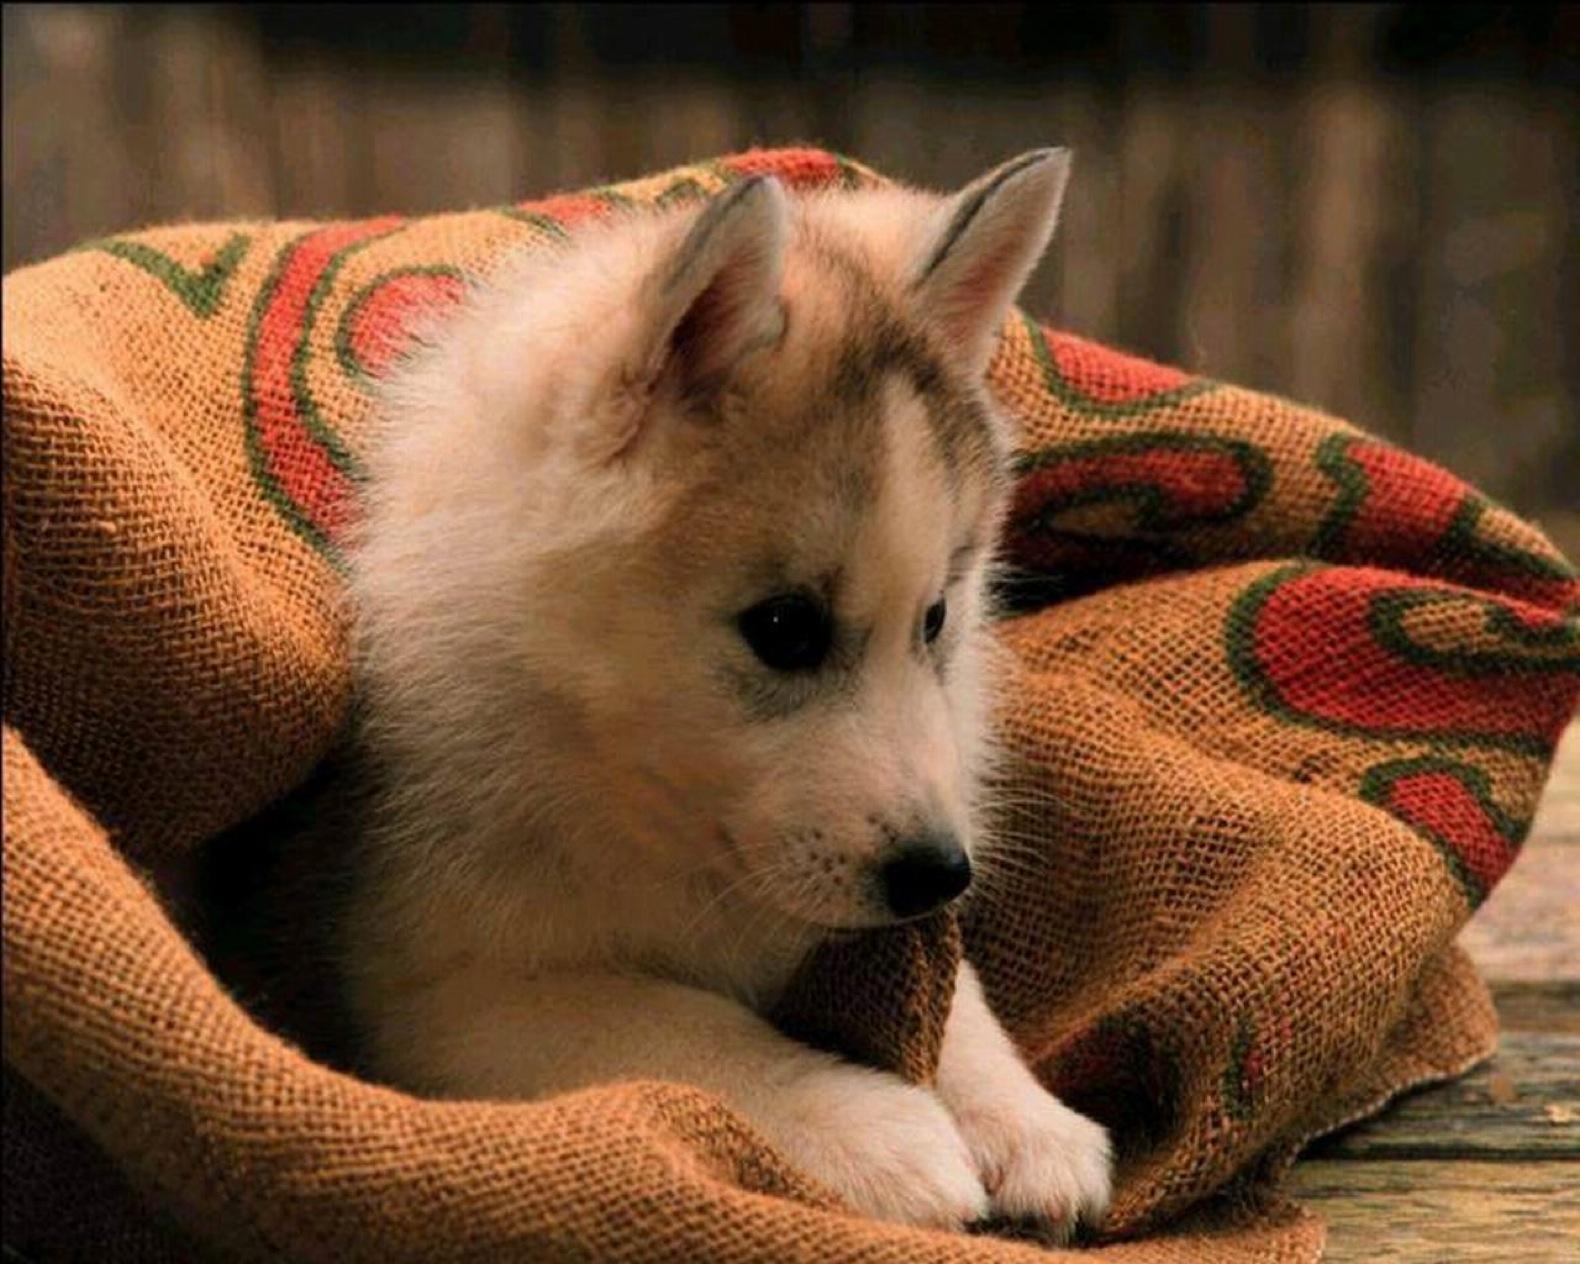 Sfondi desktop hd cani cucciolo husky sfondi hd gratis for Sfondi animali hd